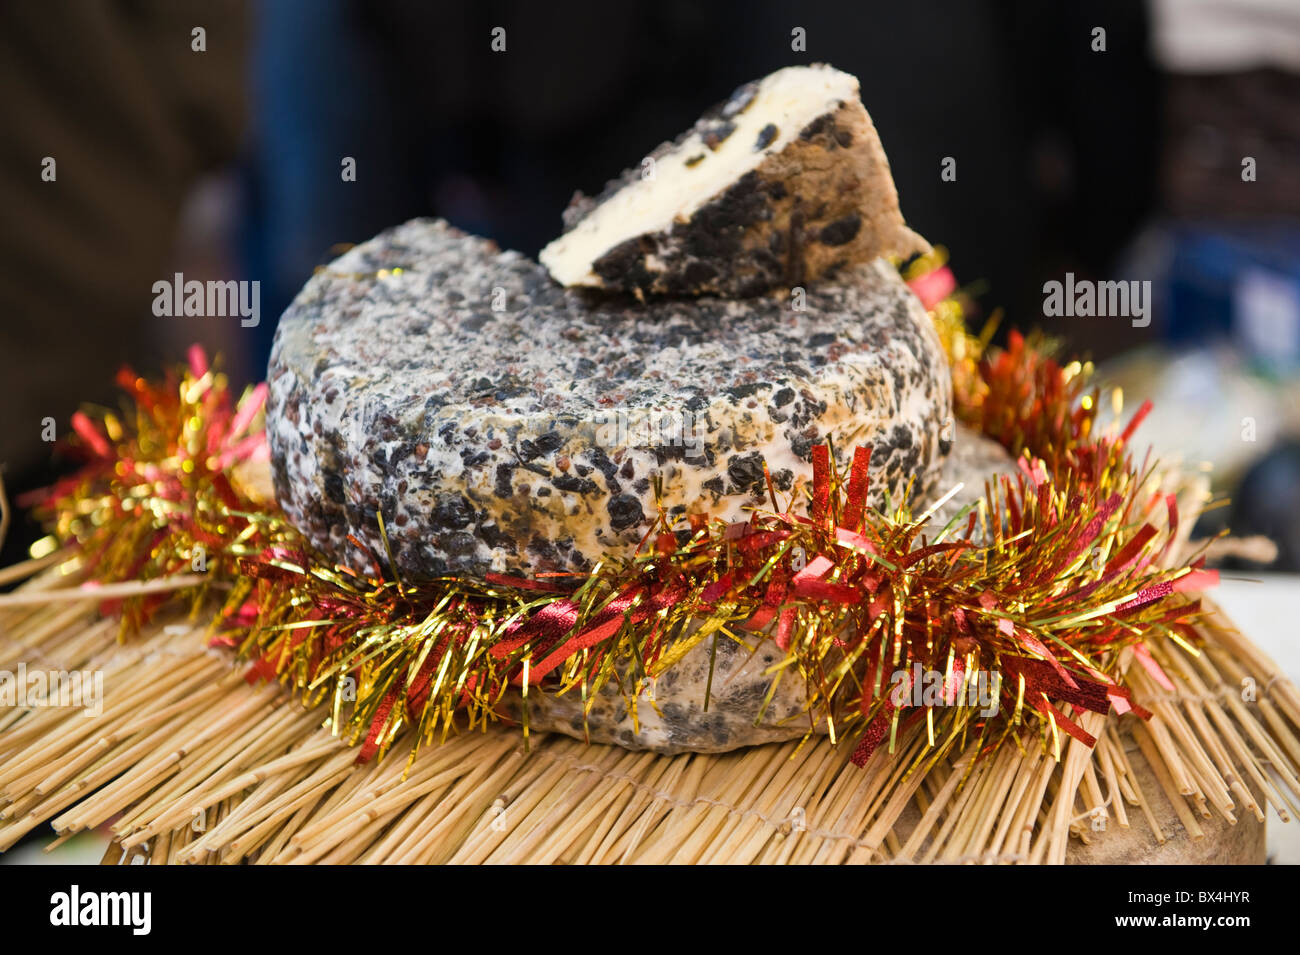 Abergavenny Christmas Food Festival